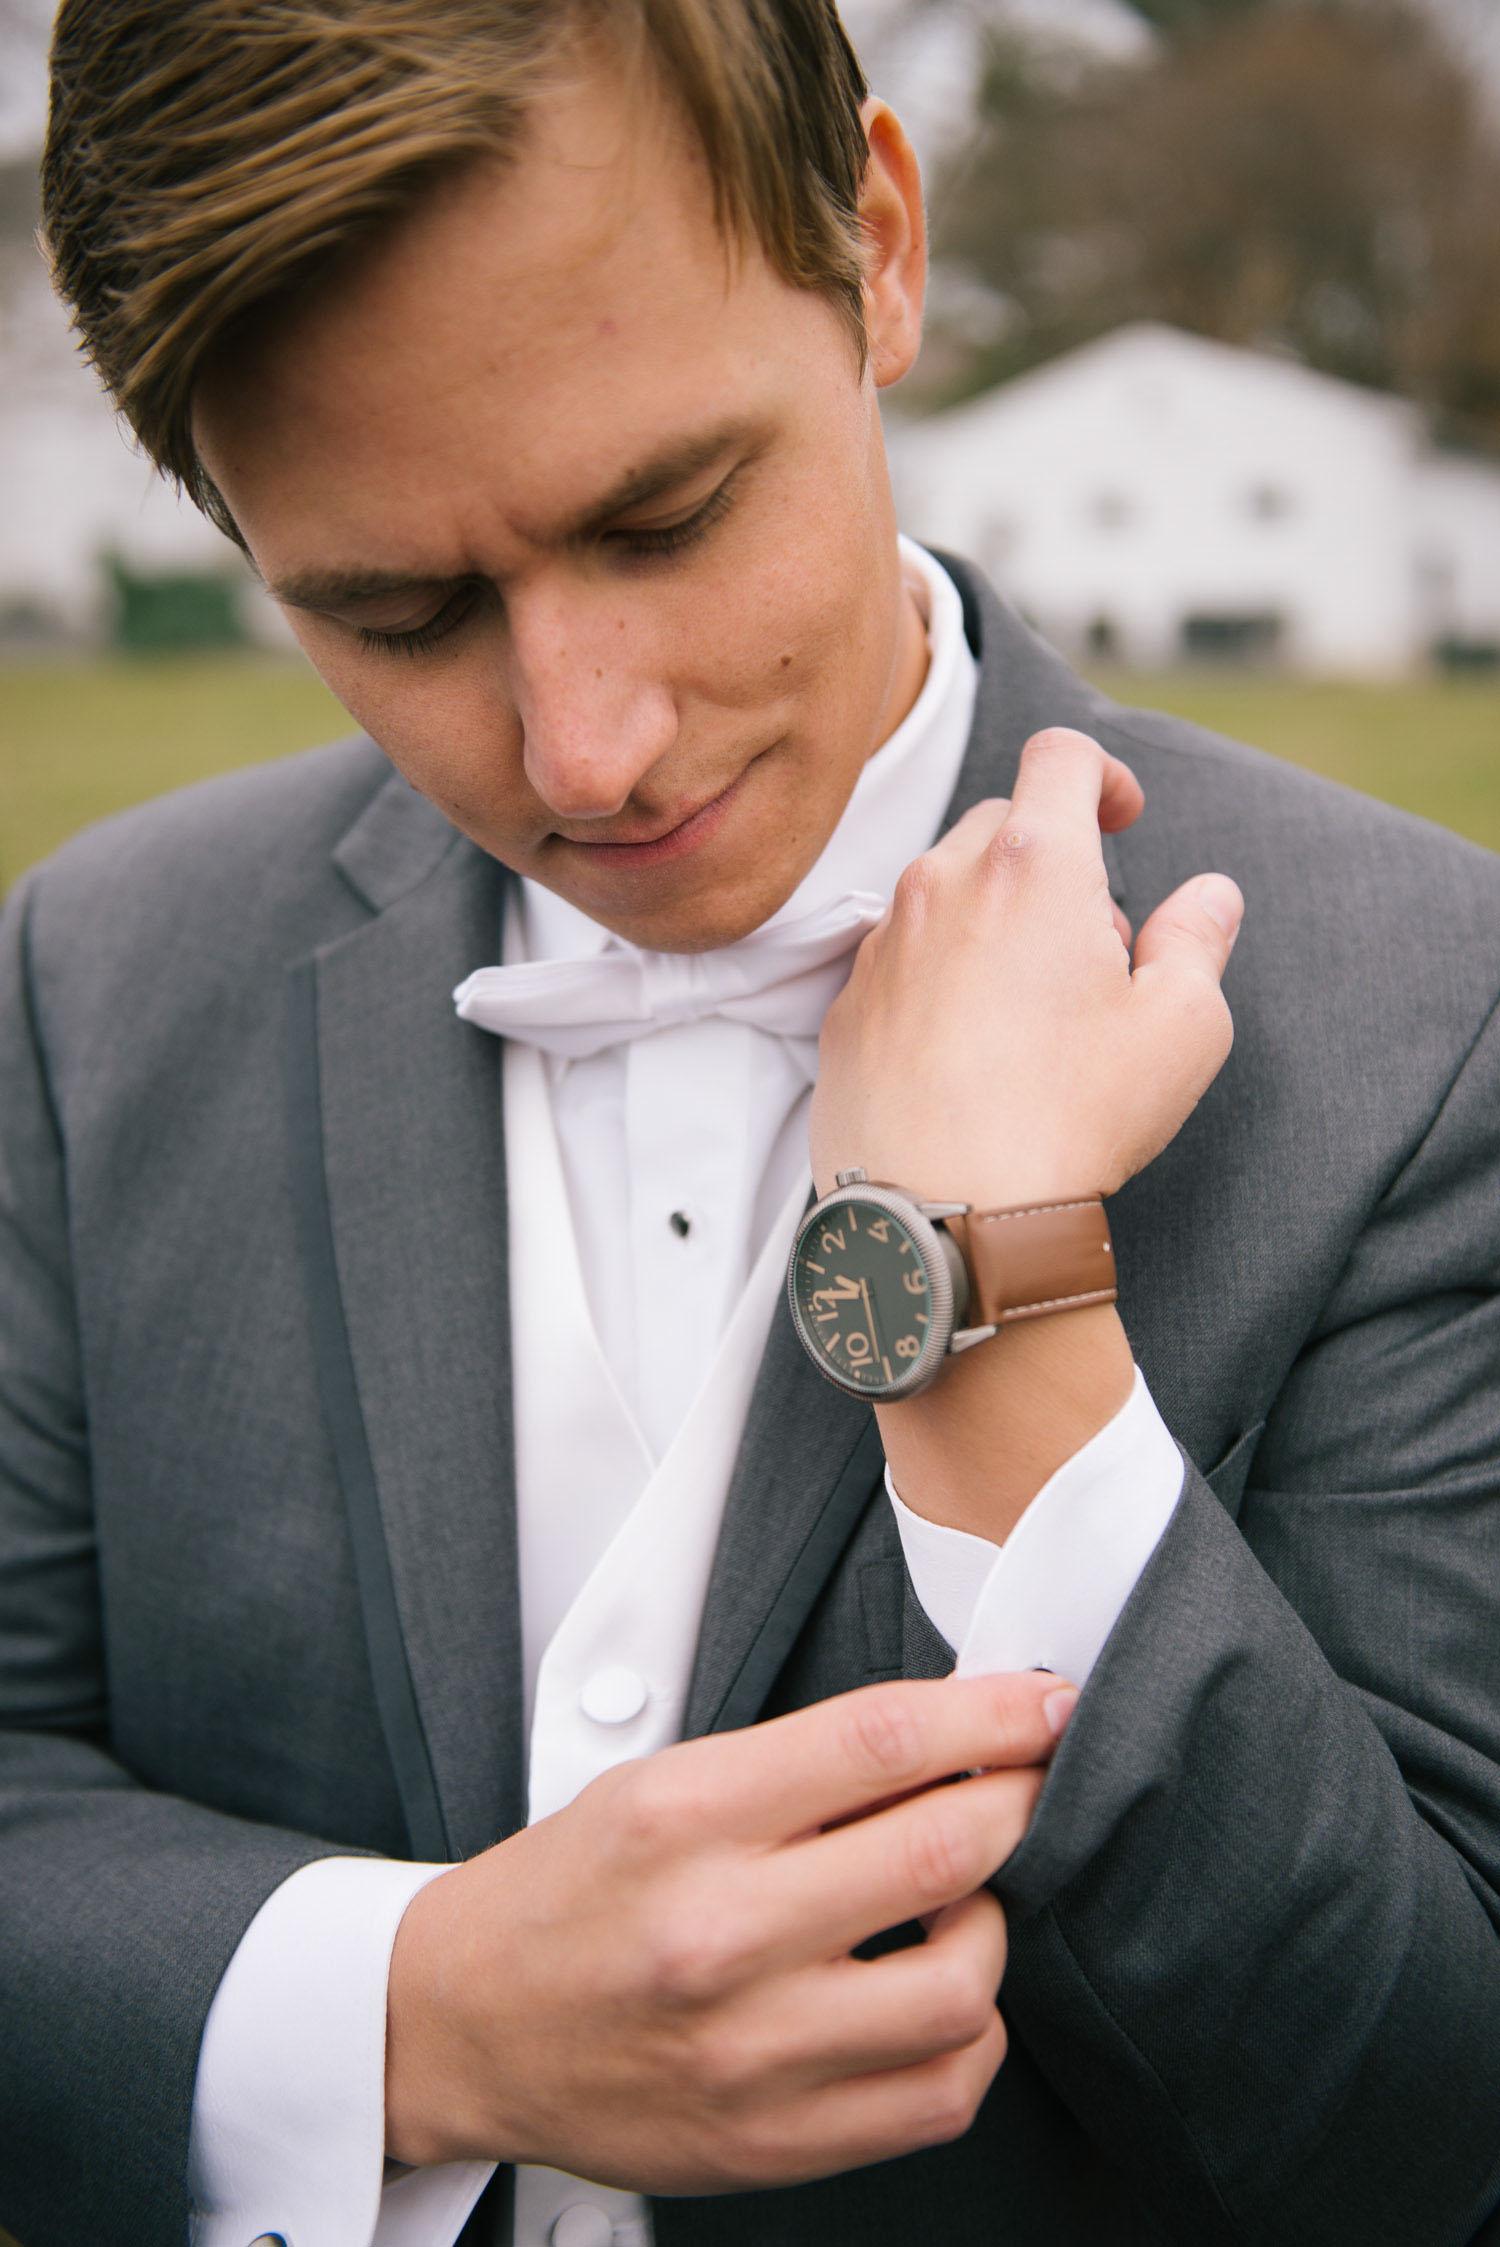 youngstrom-wedding-6.jpg